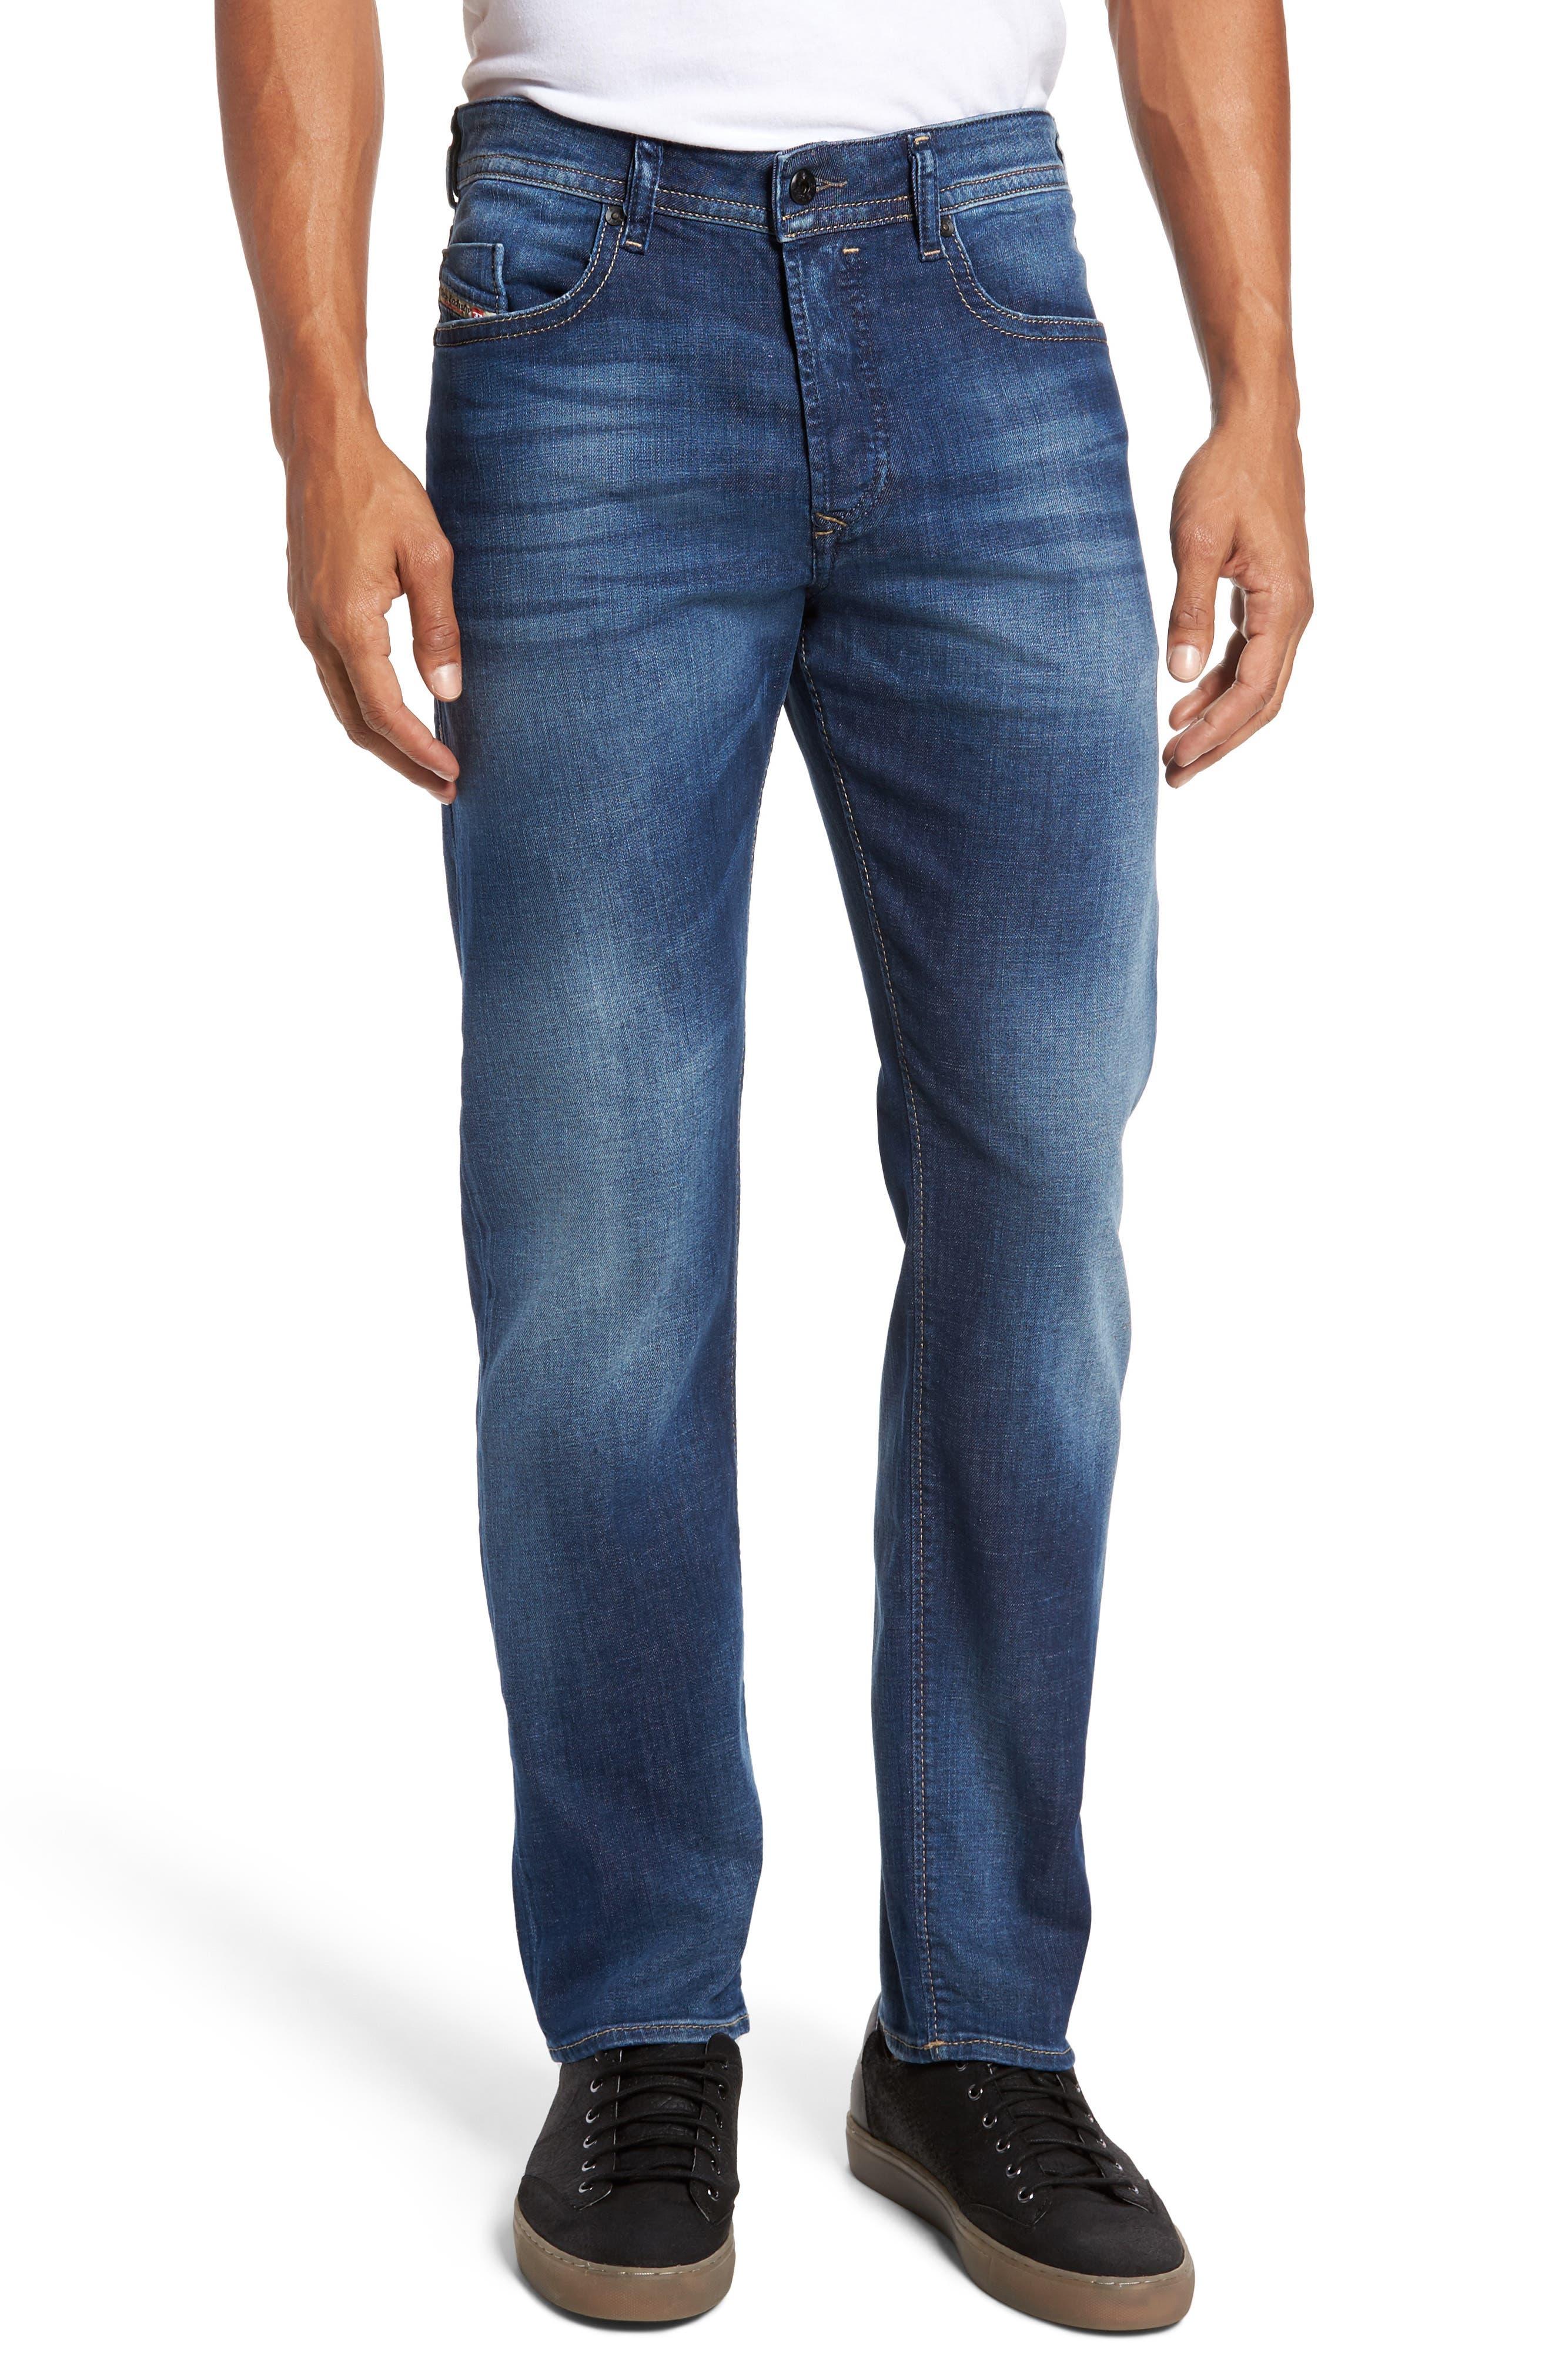 Buster Slim Straight Leg Jeans,                         Main,                         color, 084Gr